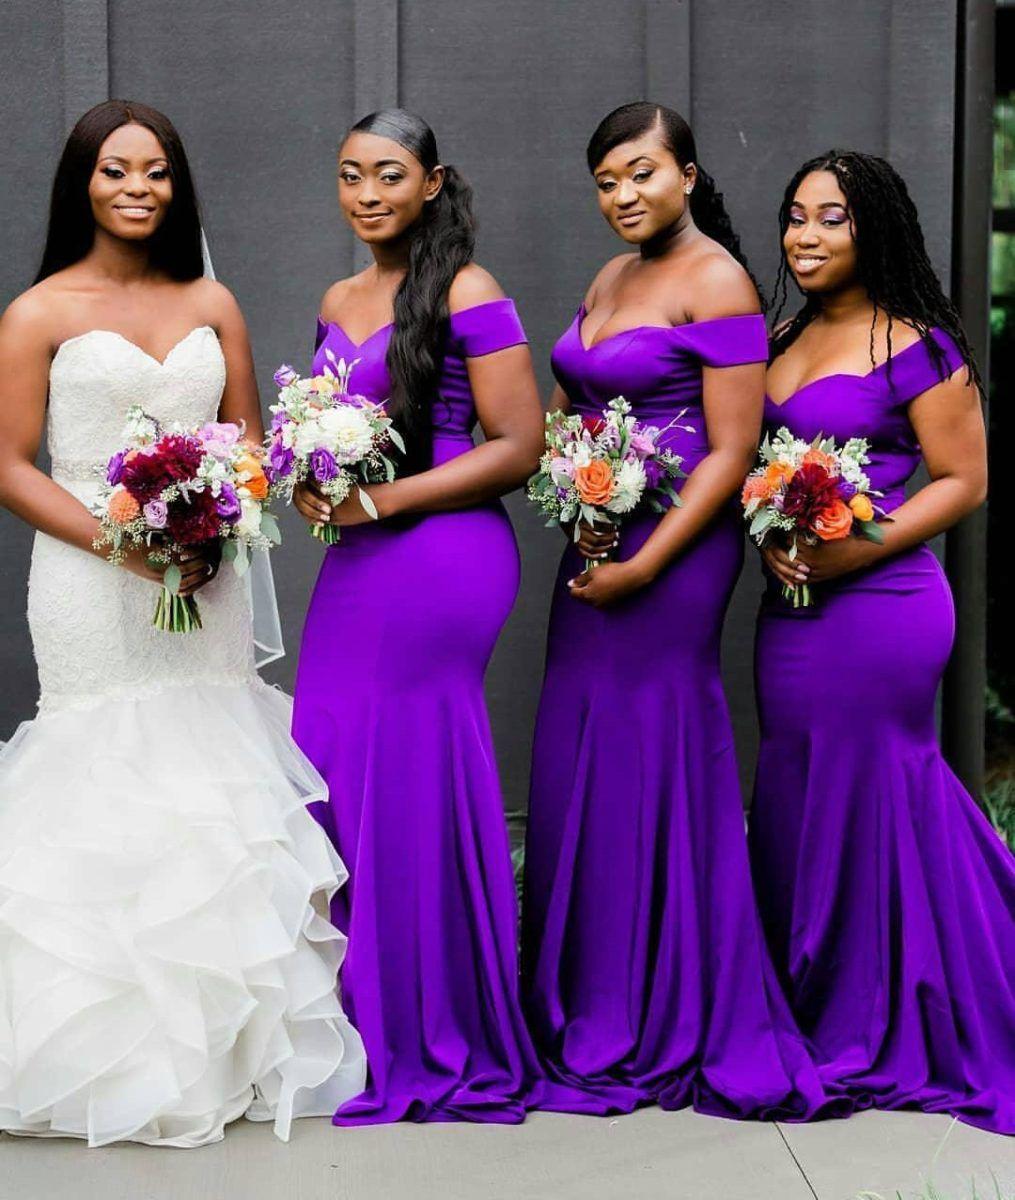 Awesome Bridal Train Wedding Dresses Looking Fabulous In 2020 Dark Purple Bridesmaid Dresses Purple Bridesmaid Dresses Bridesmaid Dresses,Formal Summer Beach Wedding Guest Dresses